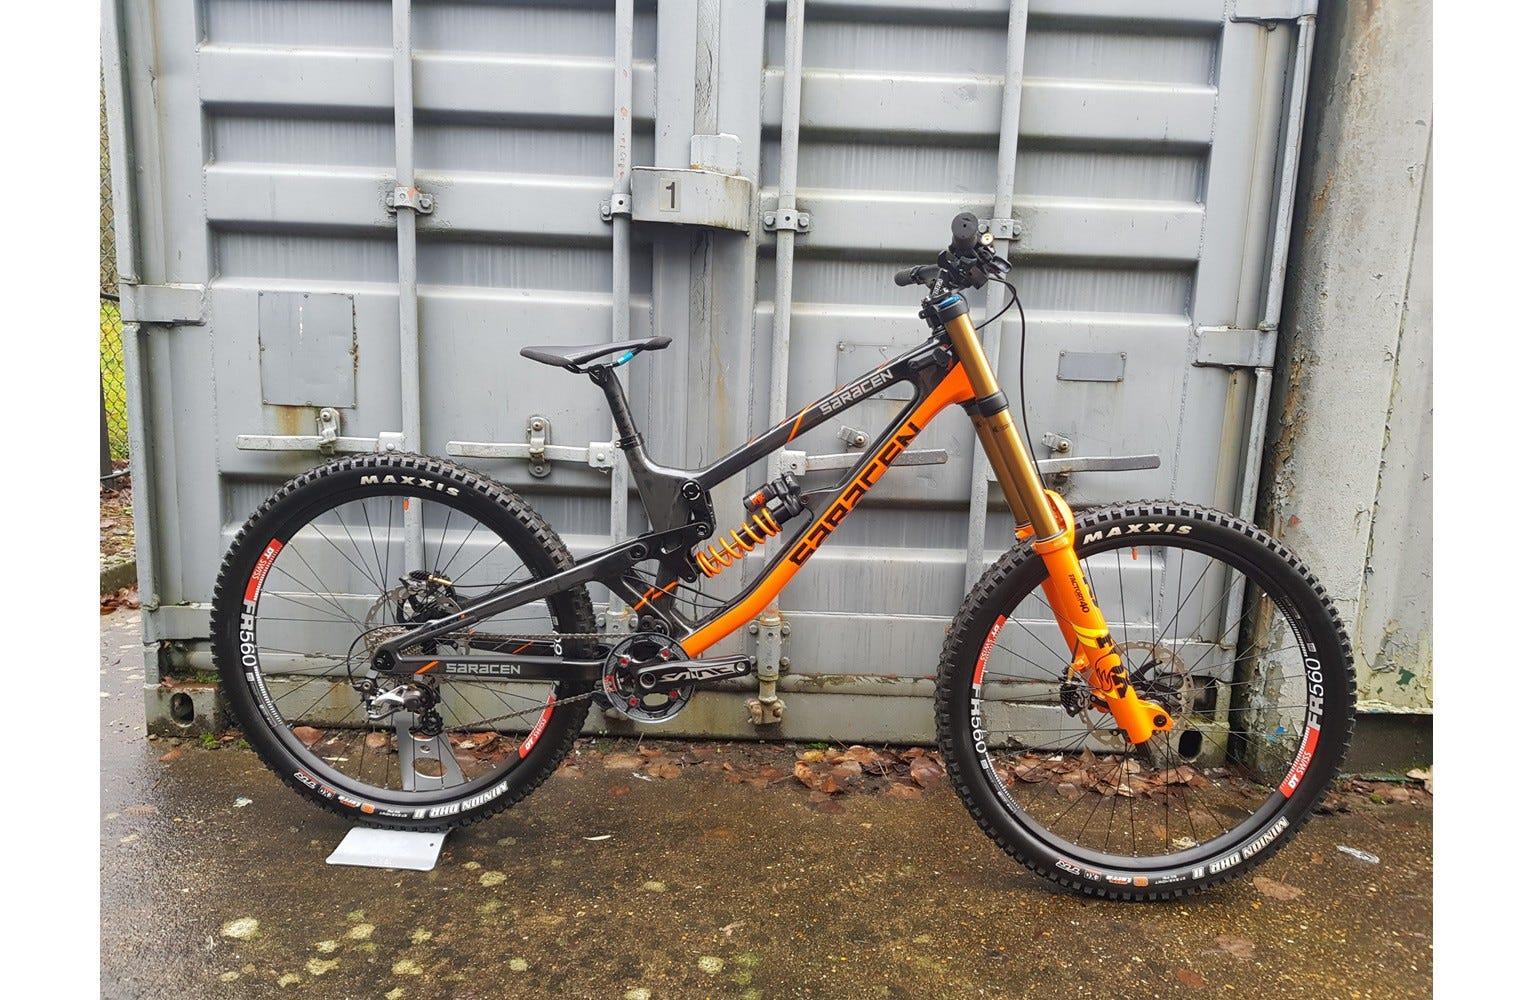 Saracen Myst Team Factory Ex Brand Sample Bike